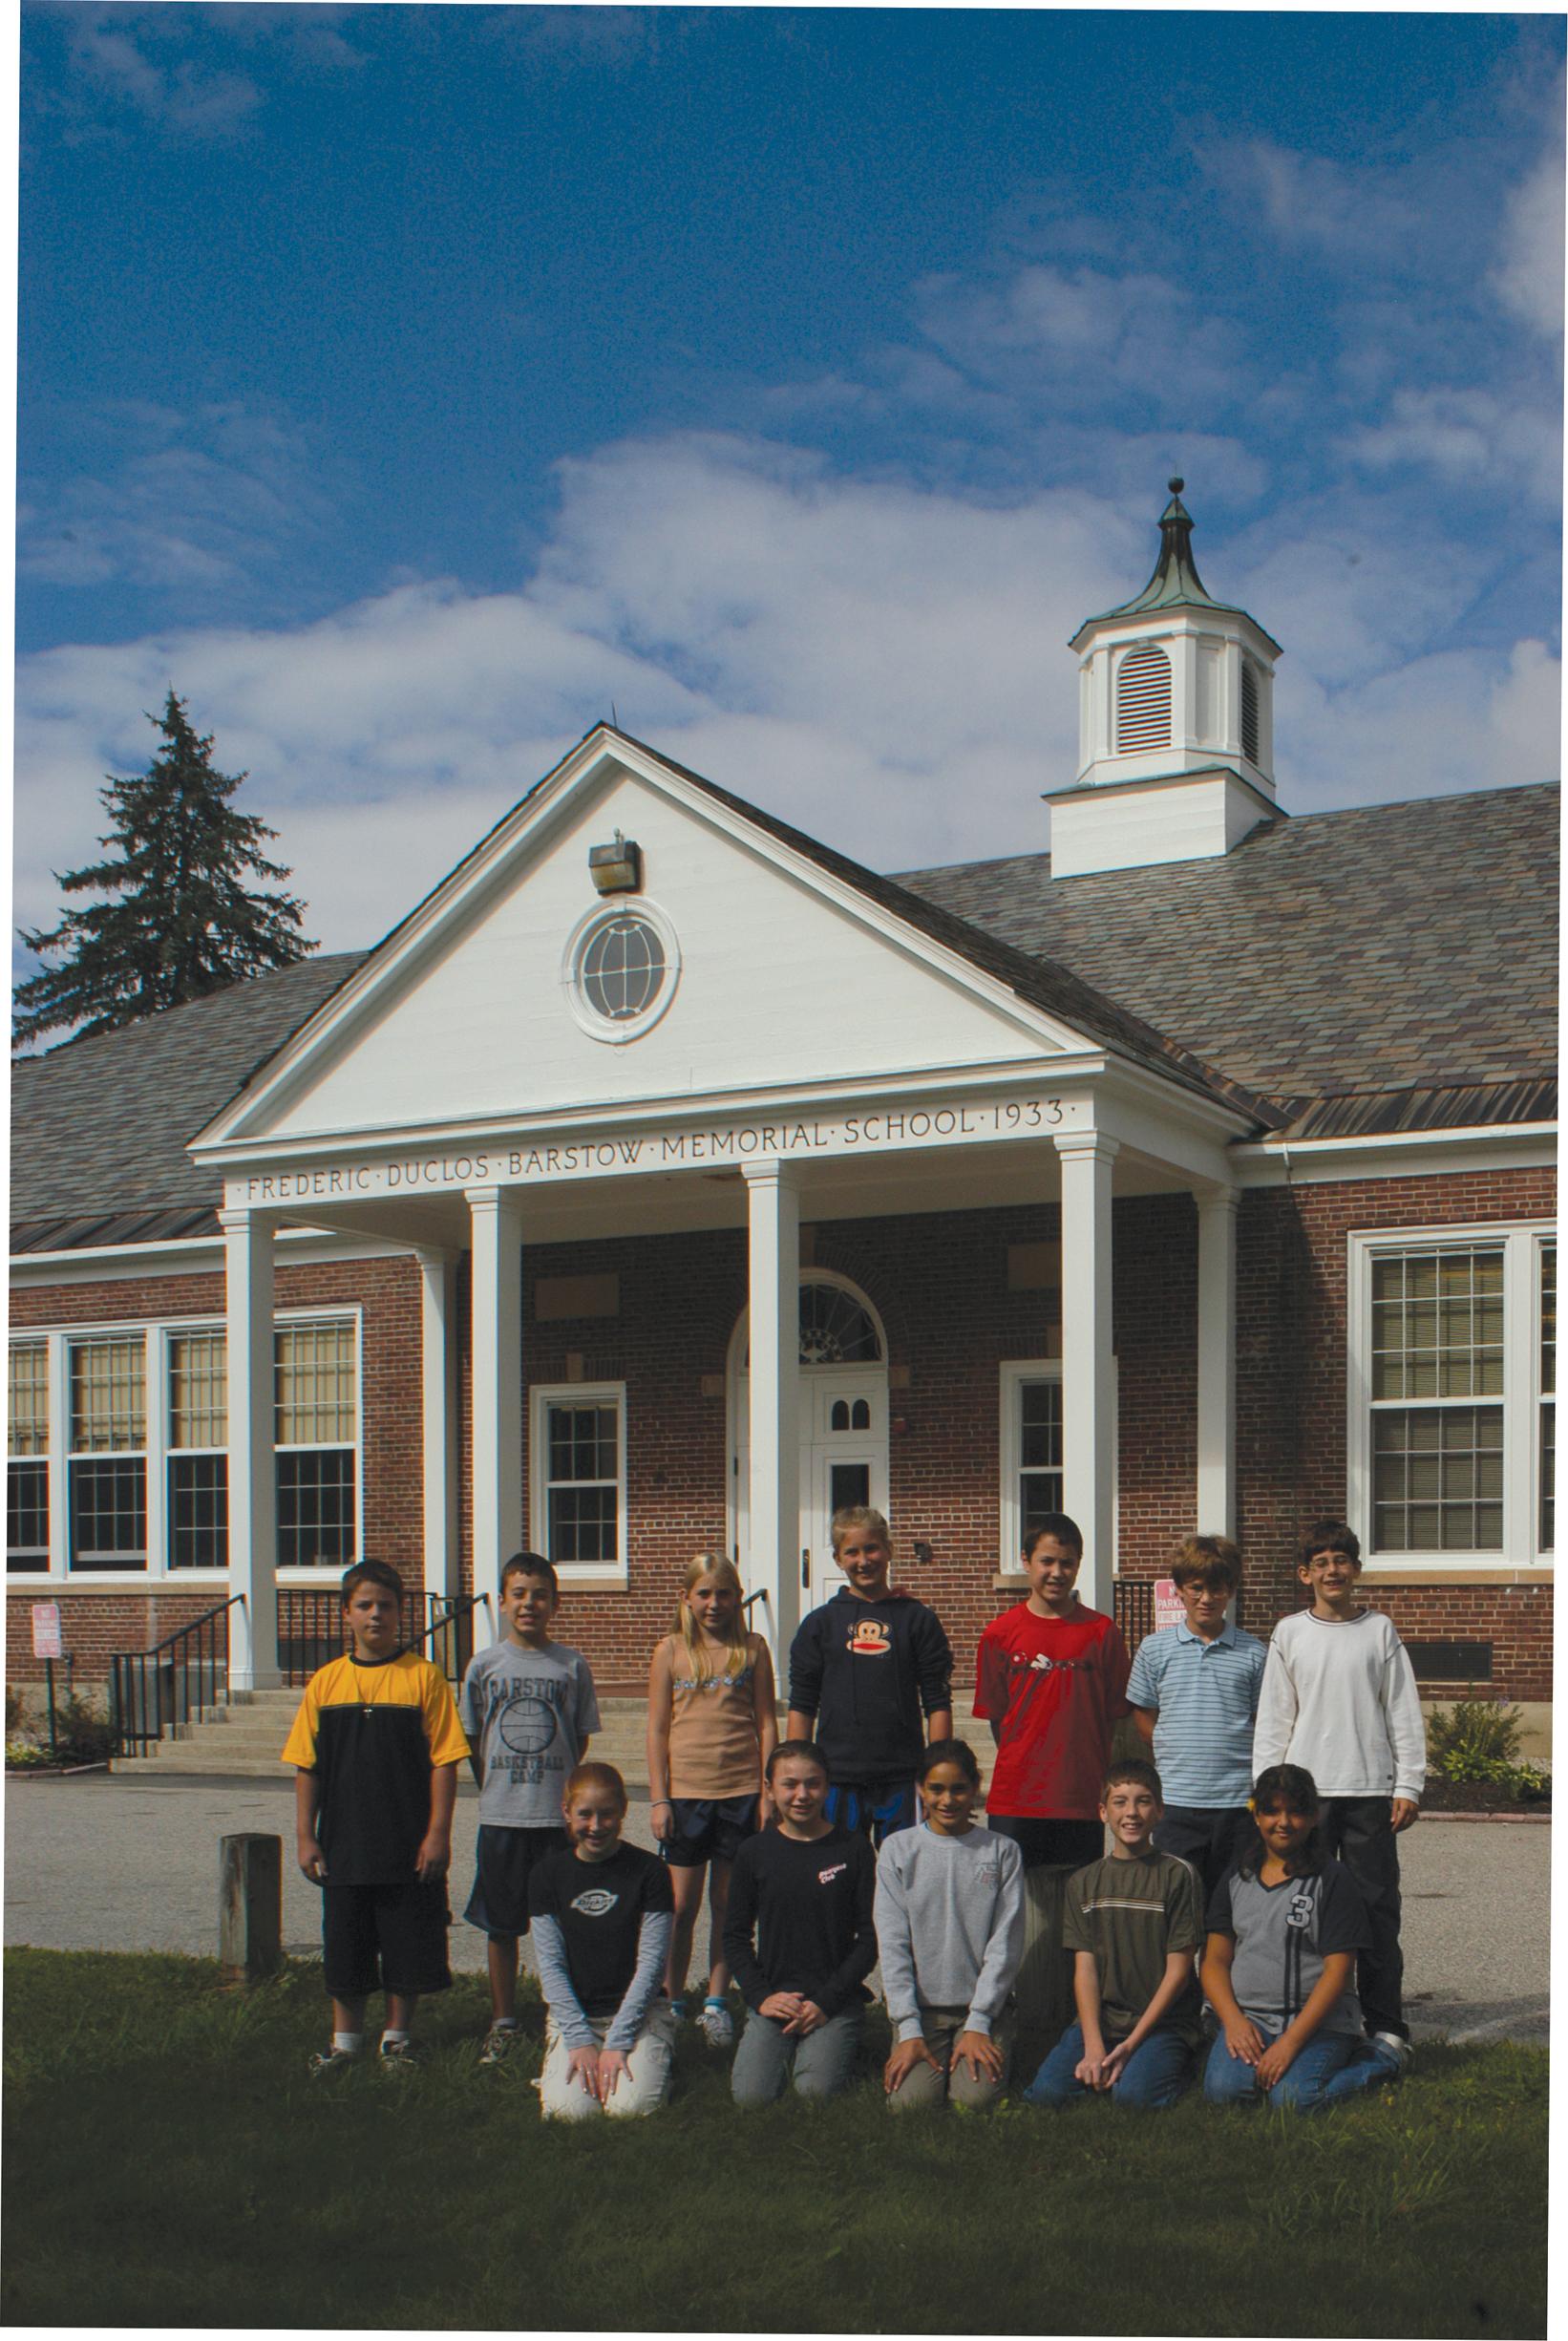 Killington Chittenden Barstow Memorial School